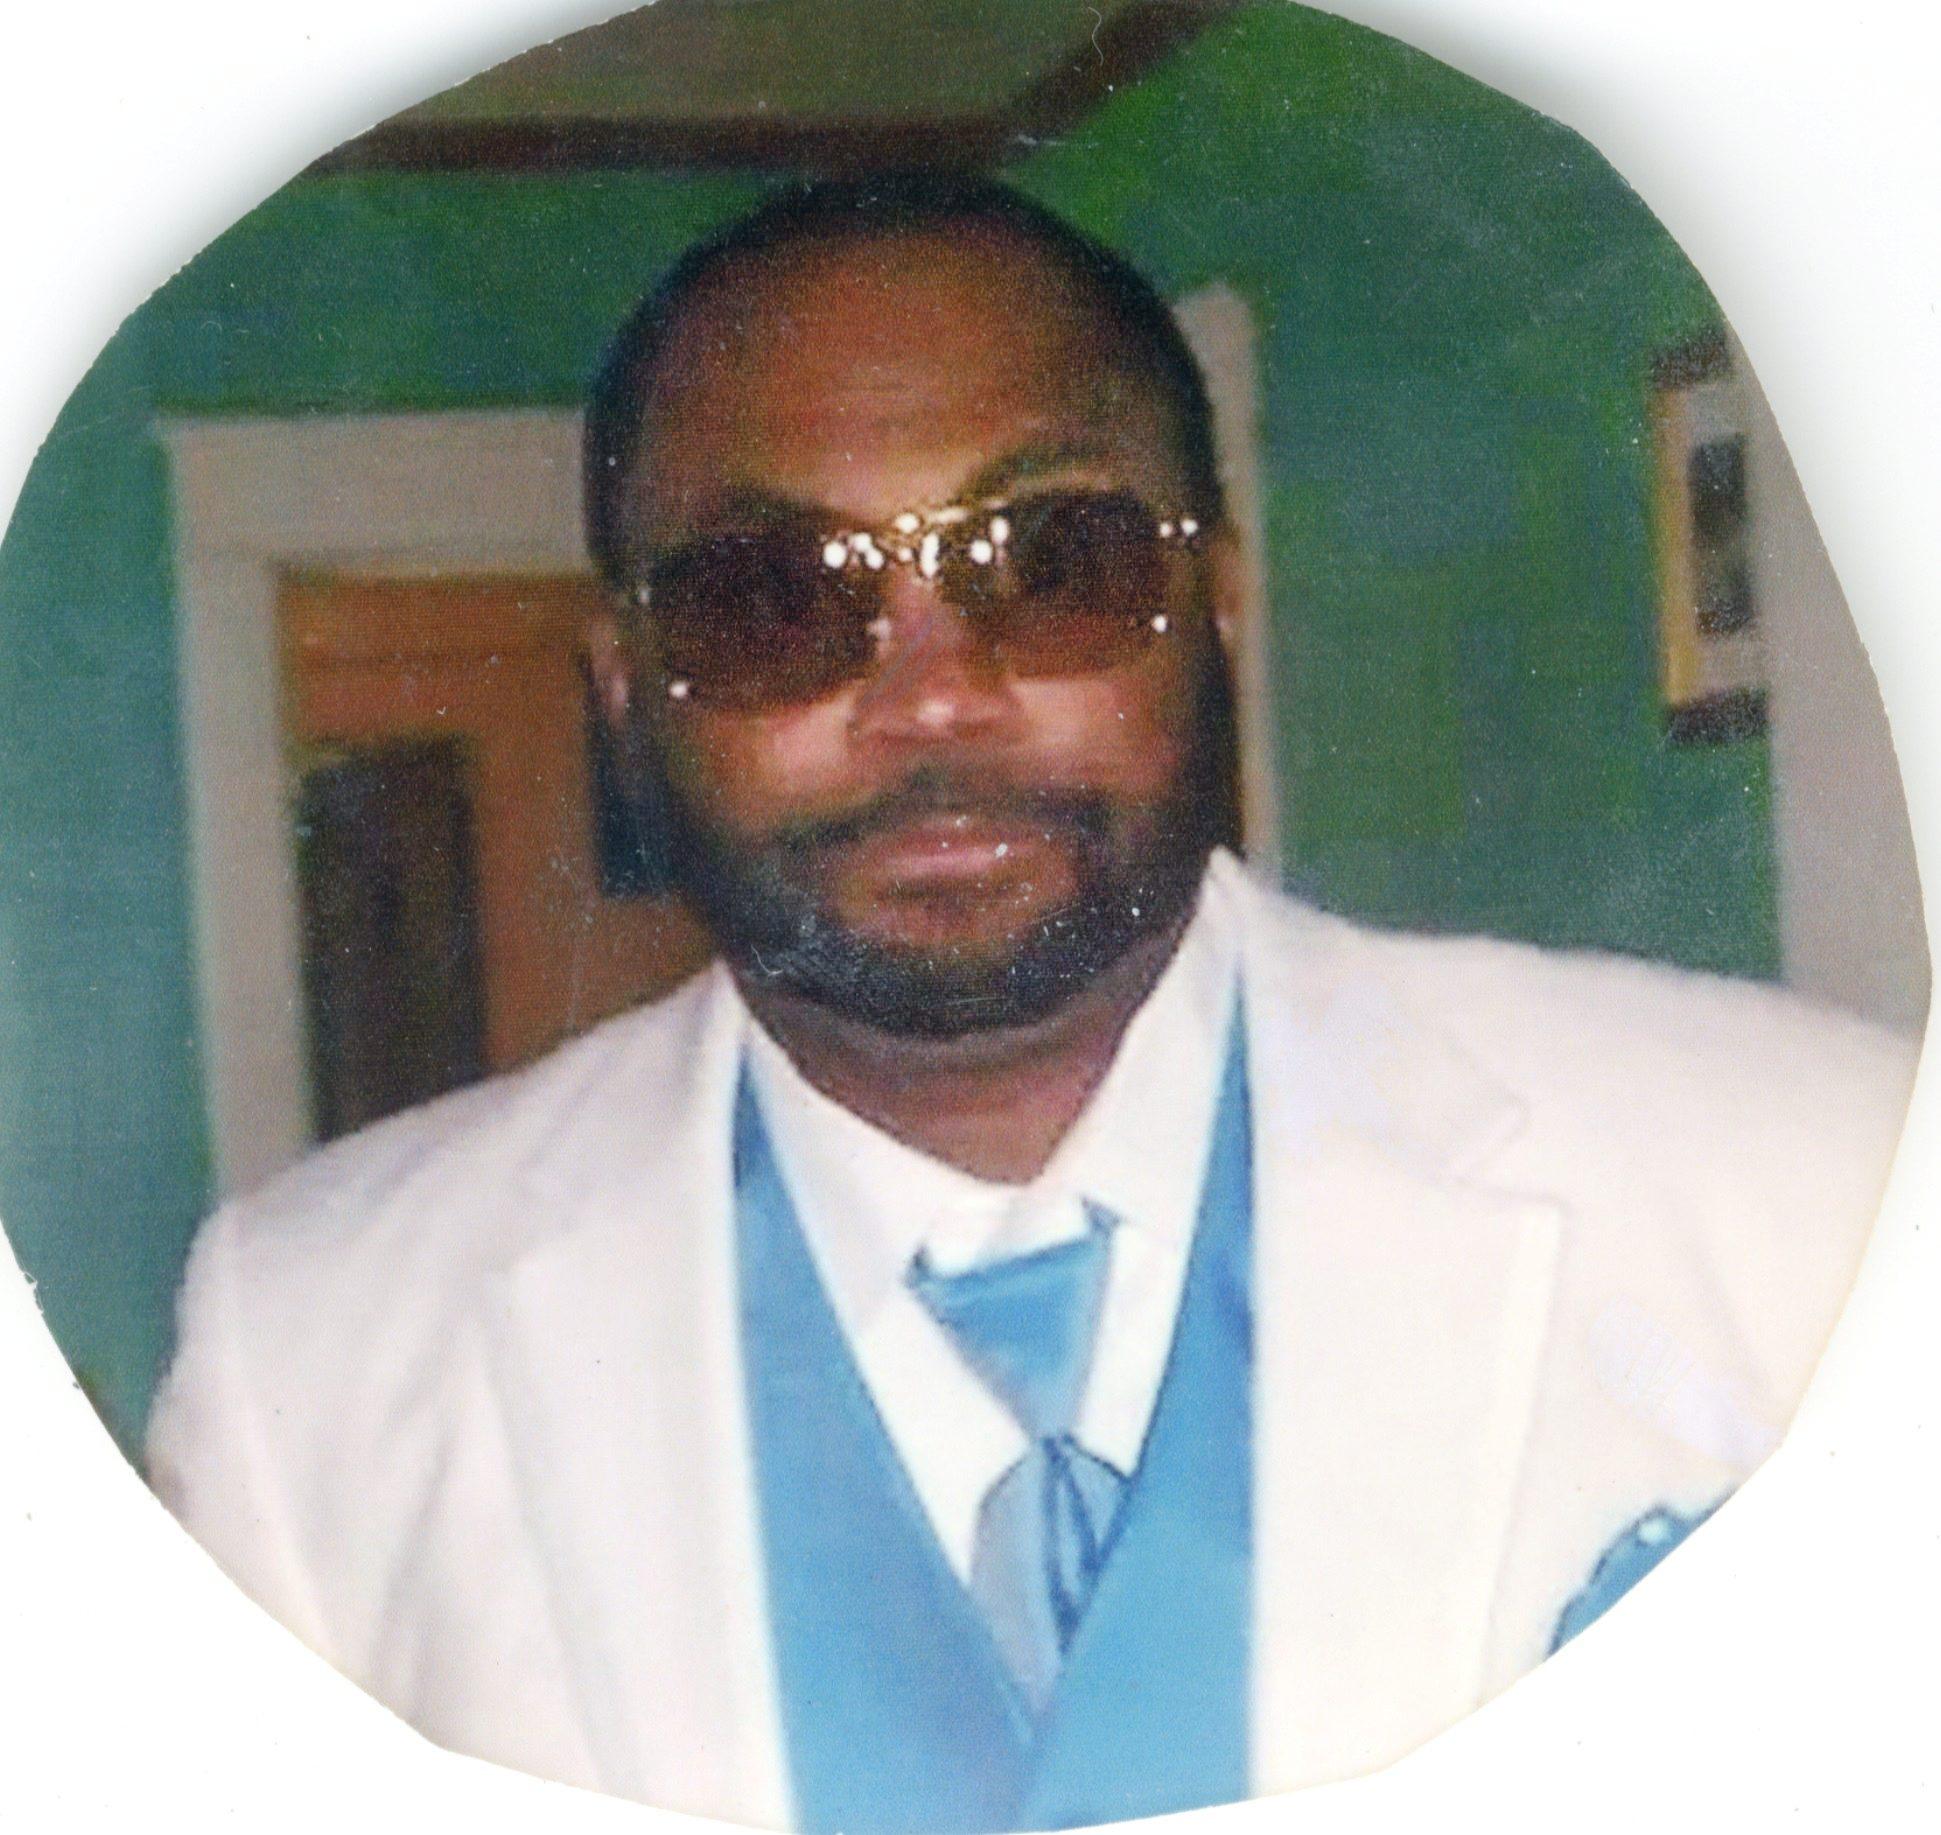 Martellion J. Ham was serving time for a DWI conviction.